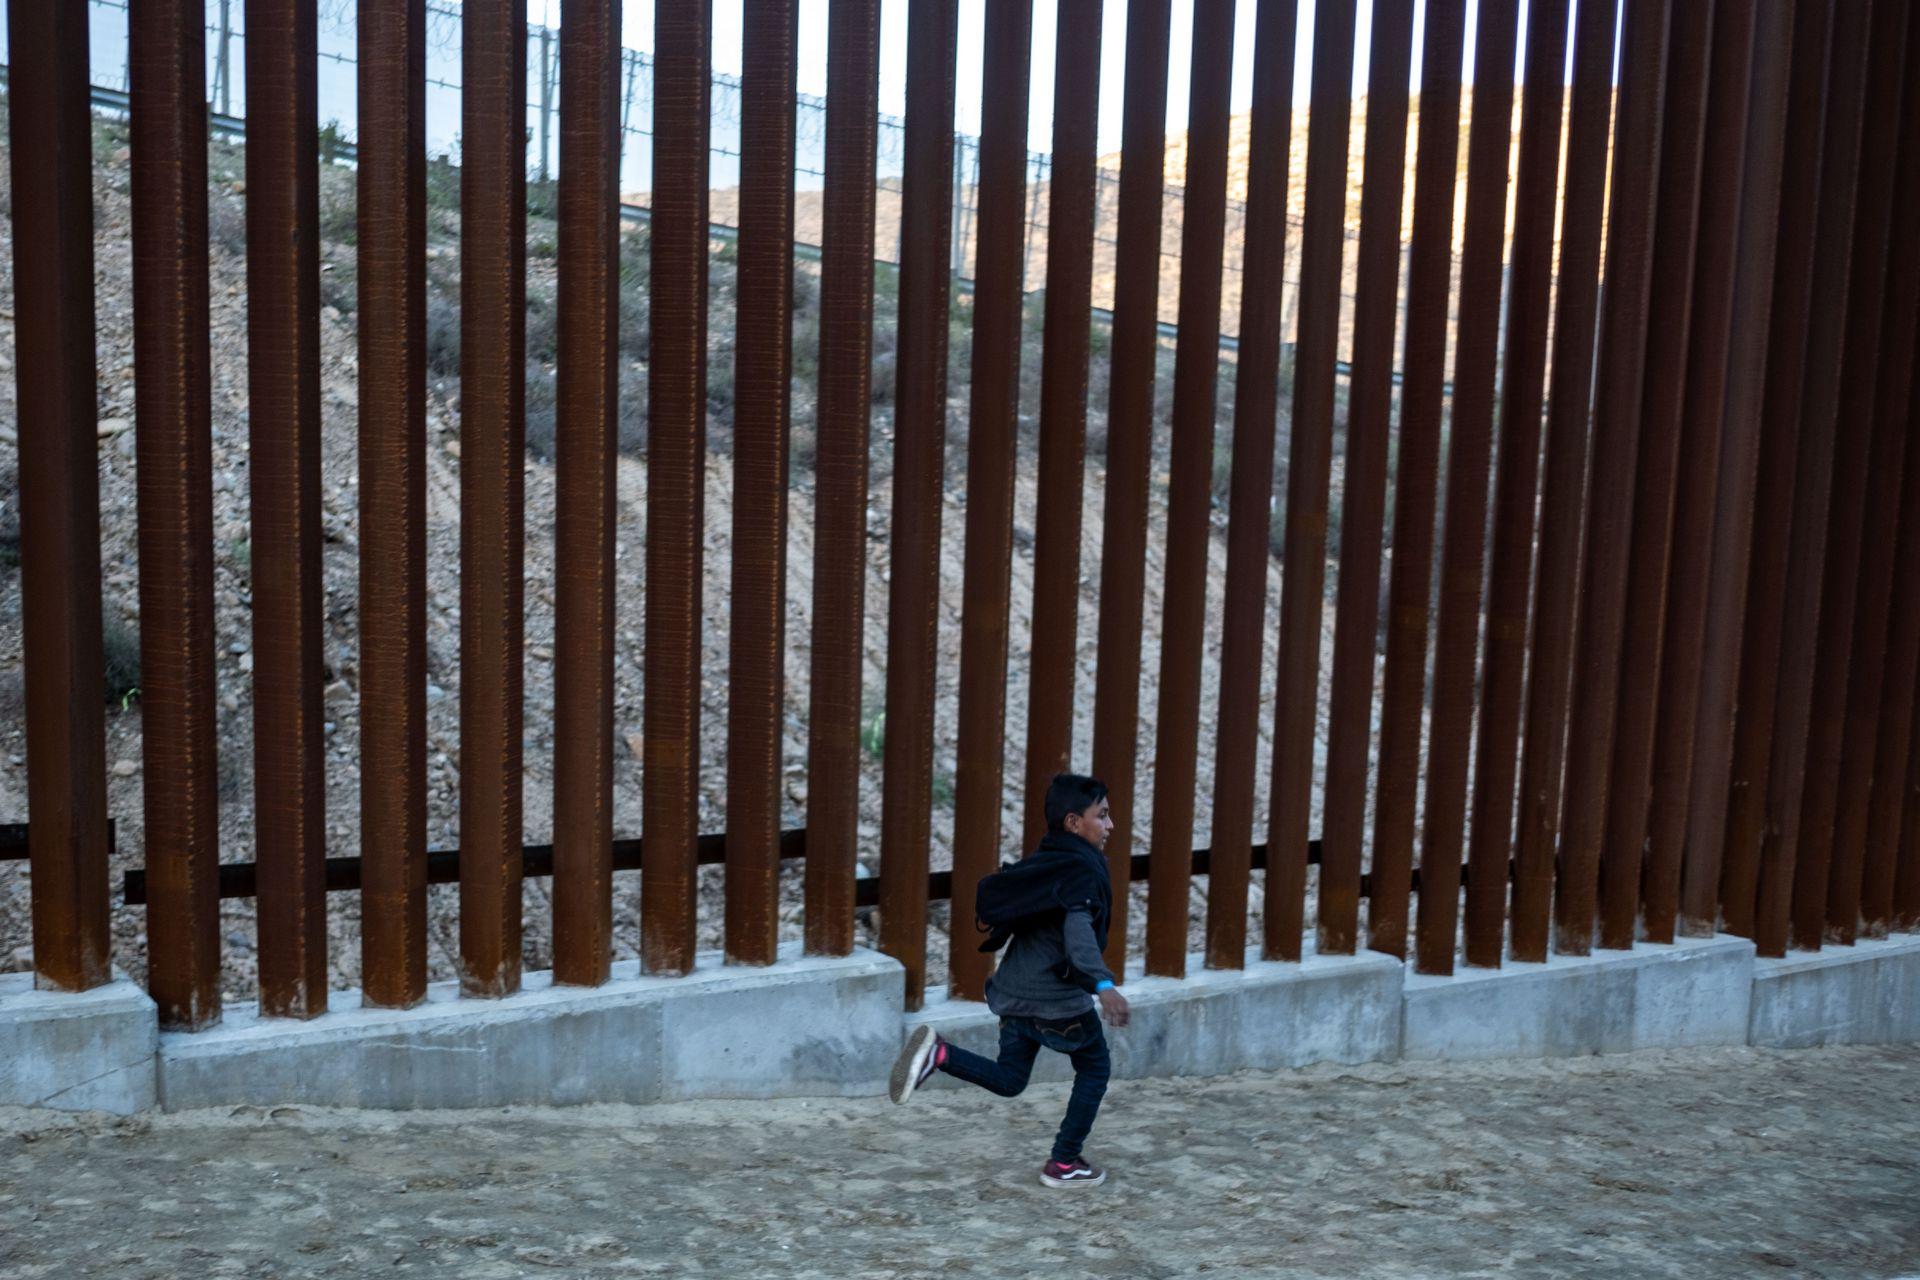 Guatemalan boy dies in U.S. custody